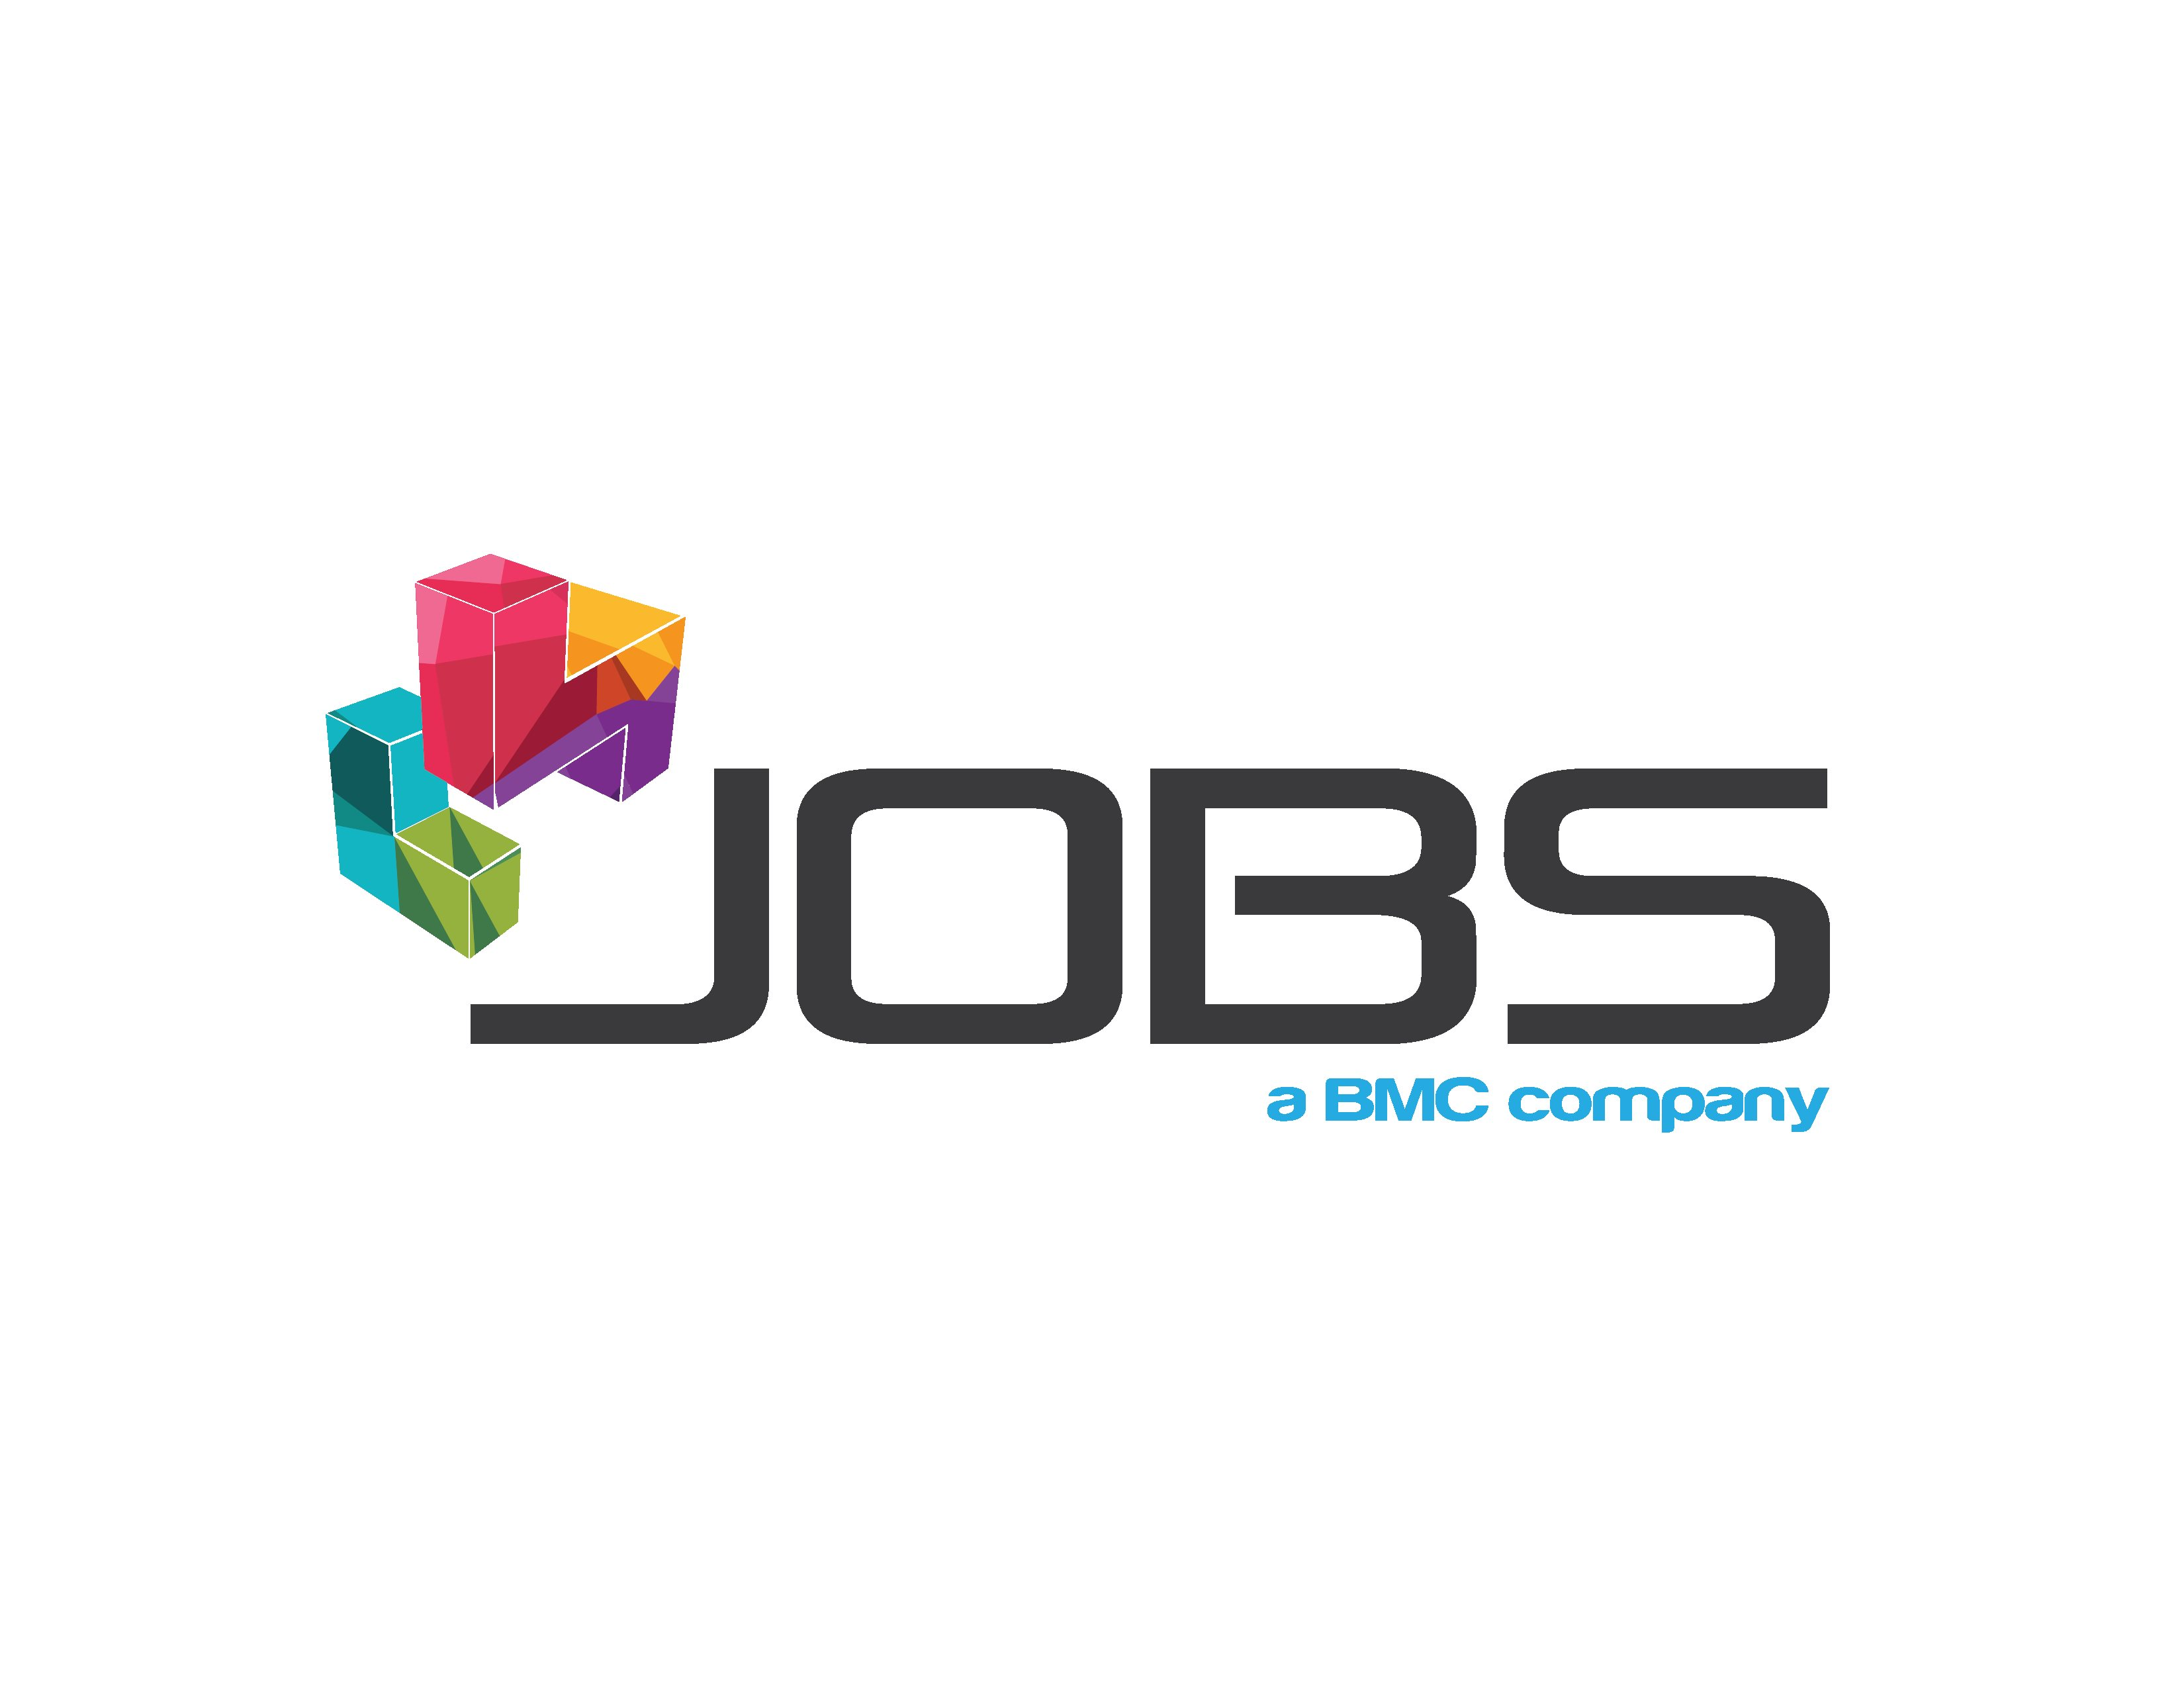 BMC Jobs